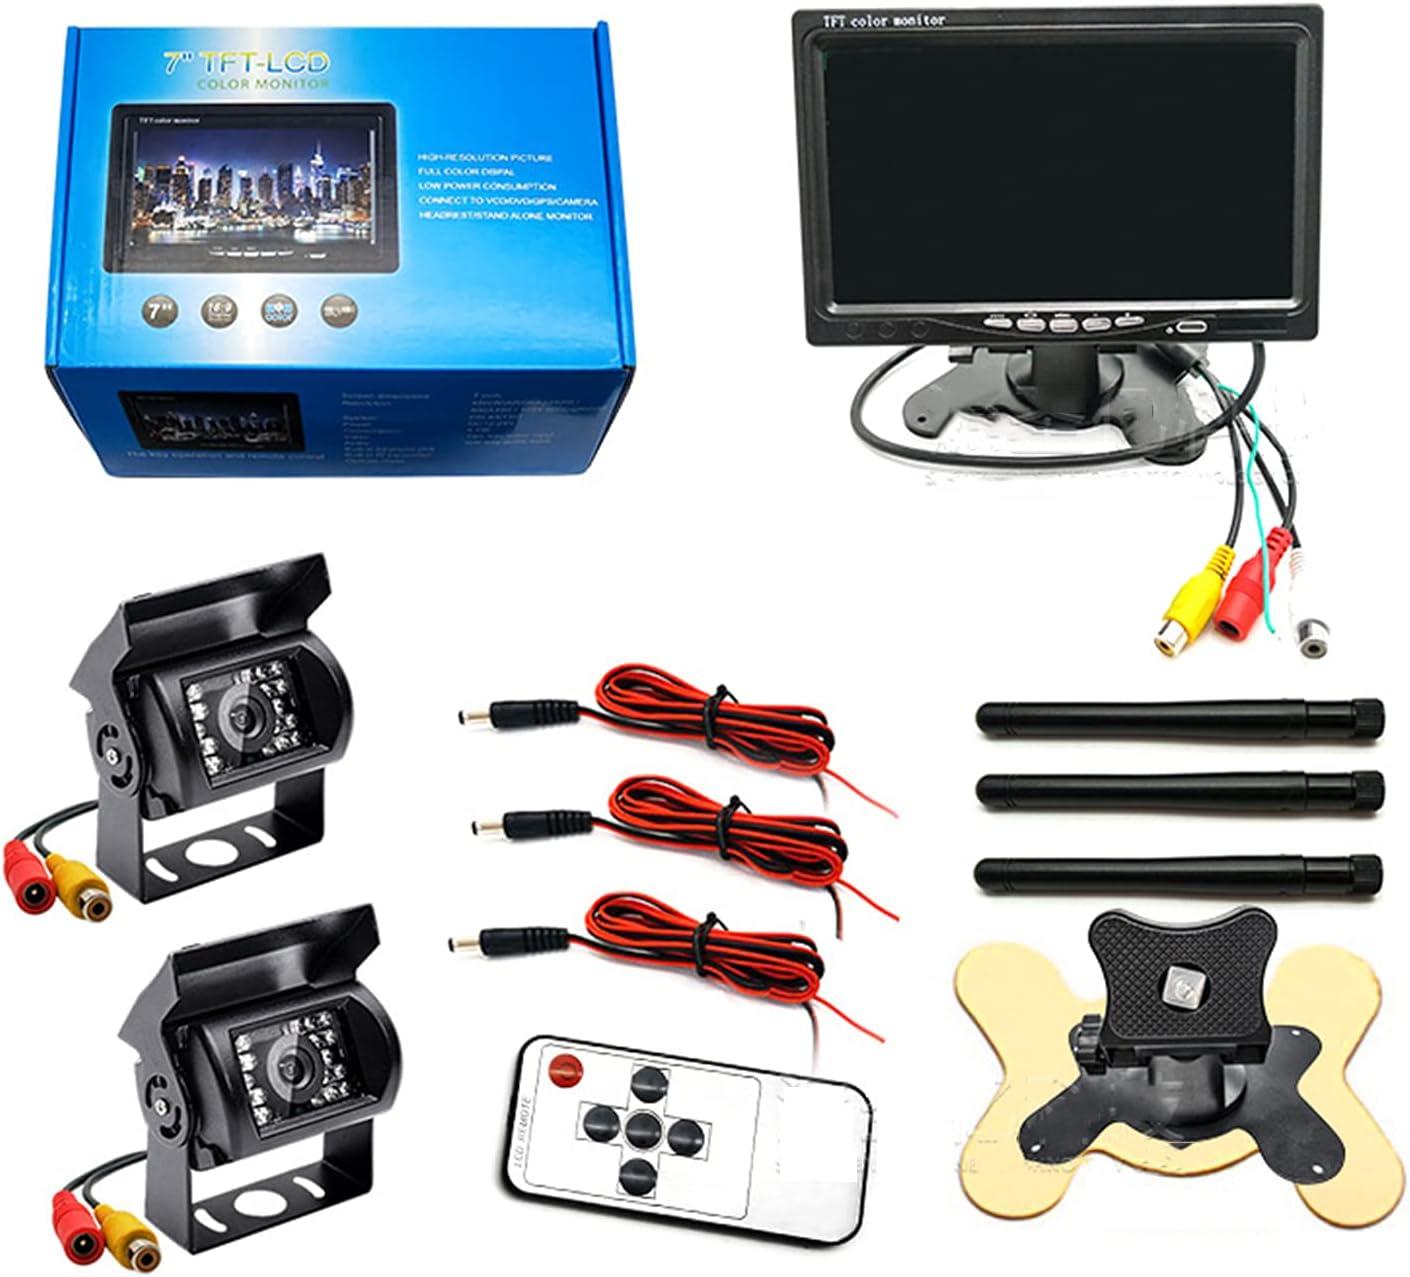 Liawnwooo Wireless Backup Camera2 Limited price sale Baltimore Mall with Monitor HD Waterproof 7